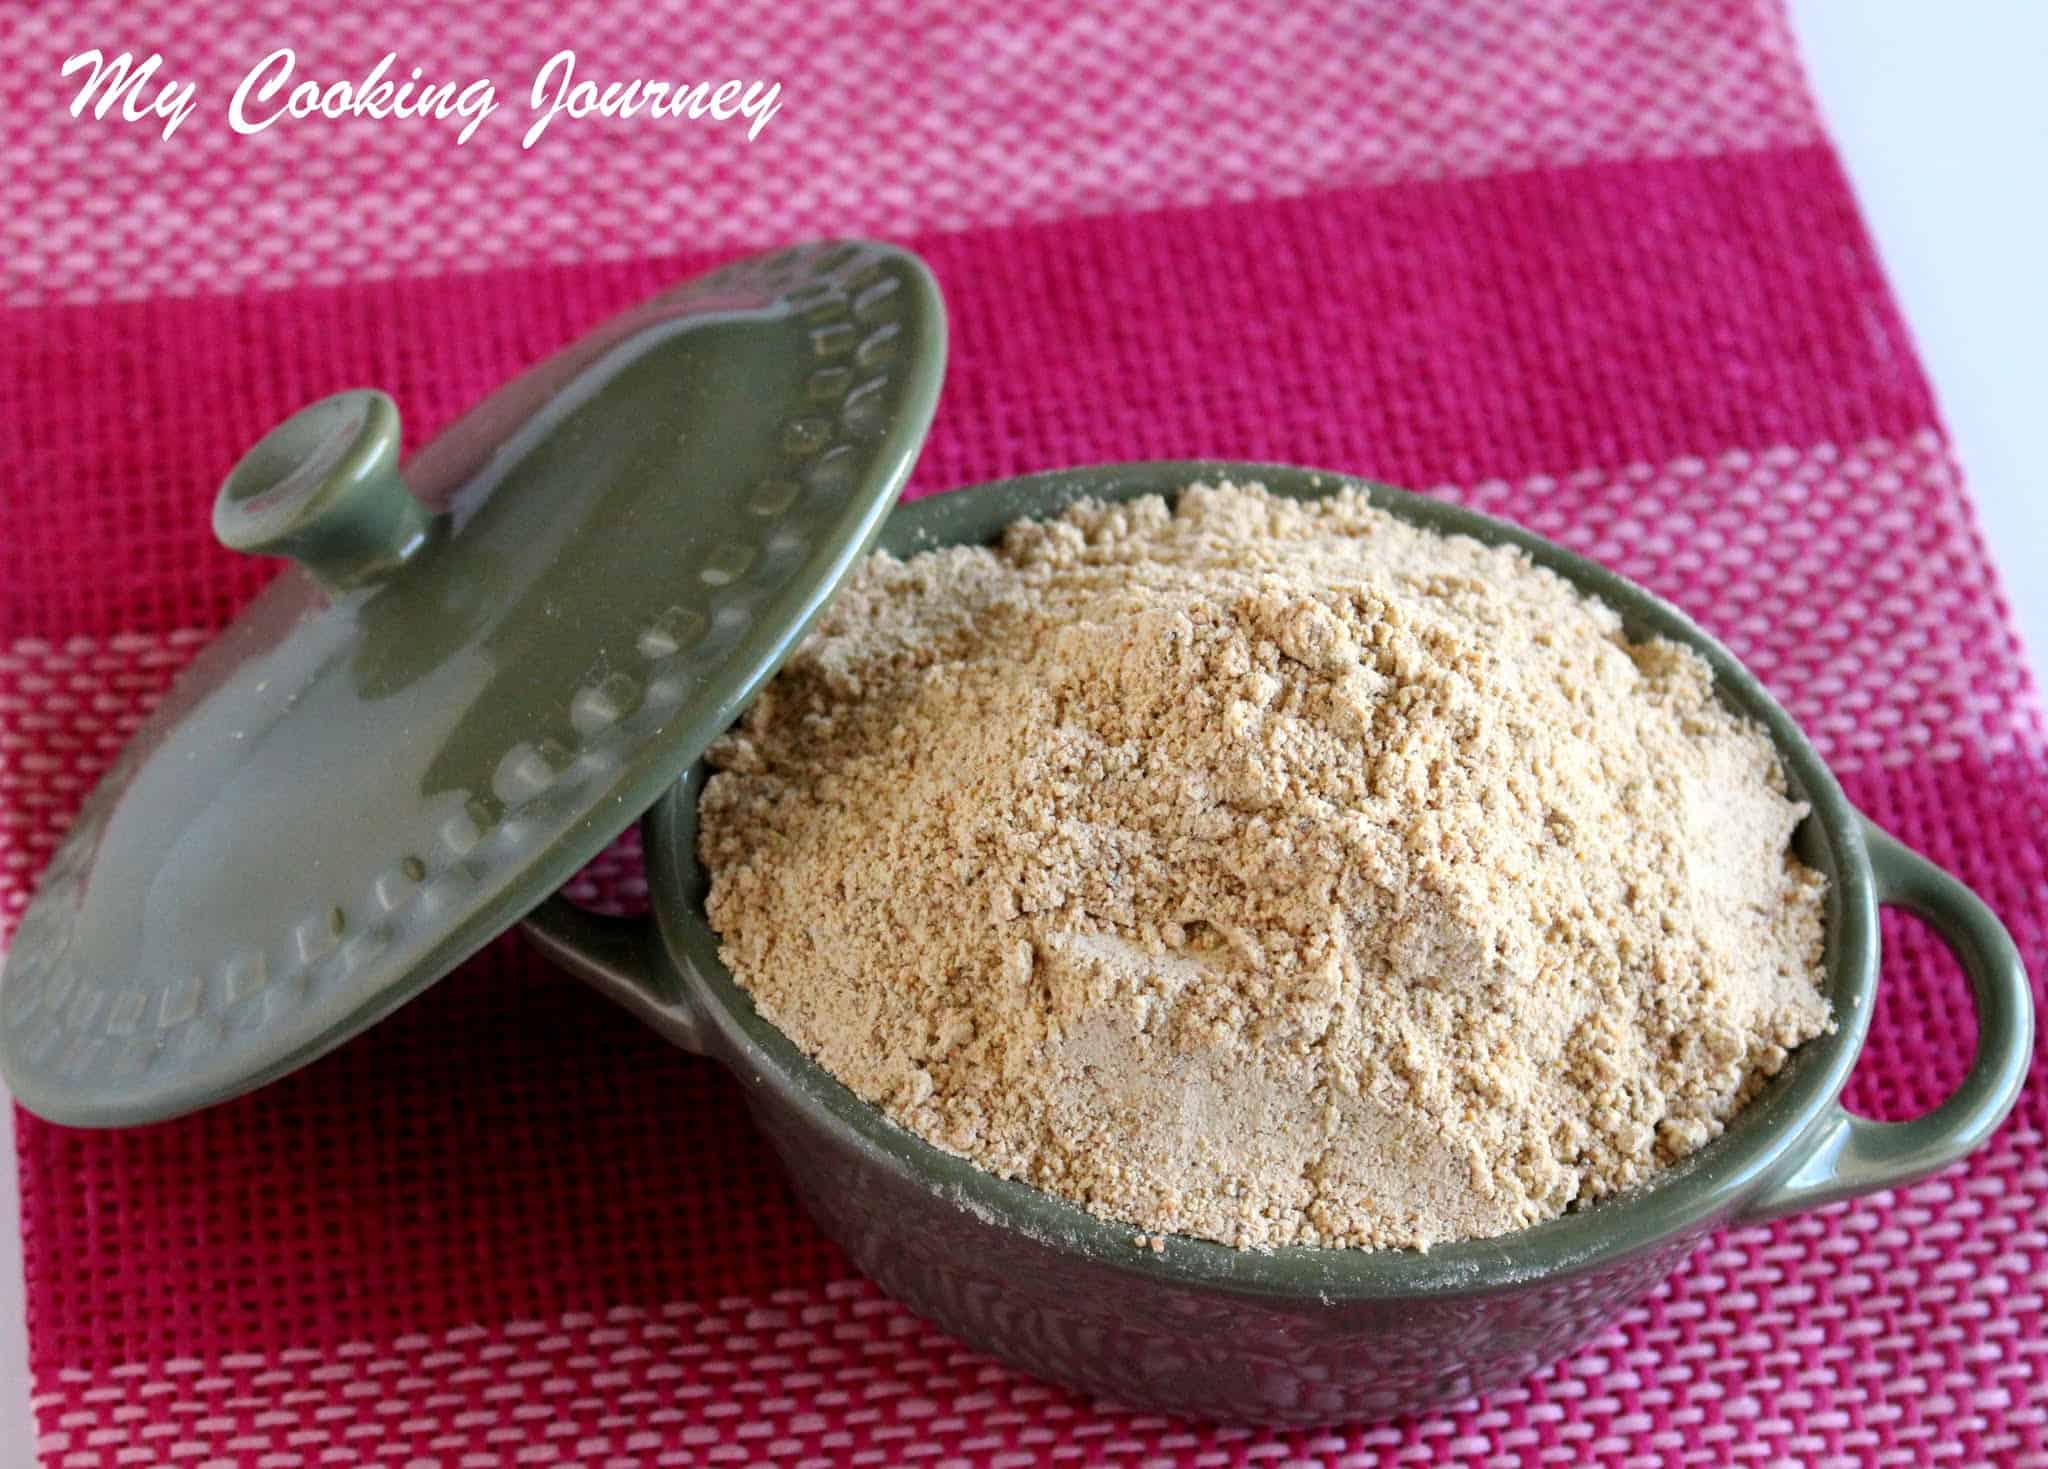 Paruppu Podi – Spiced Lentil Powder for Rice